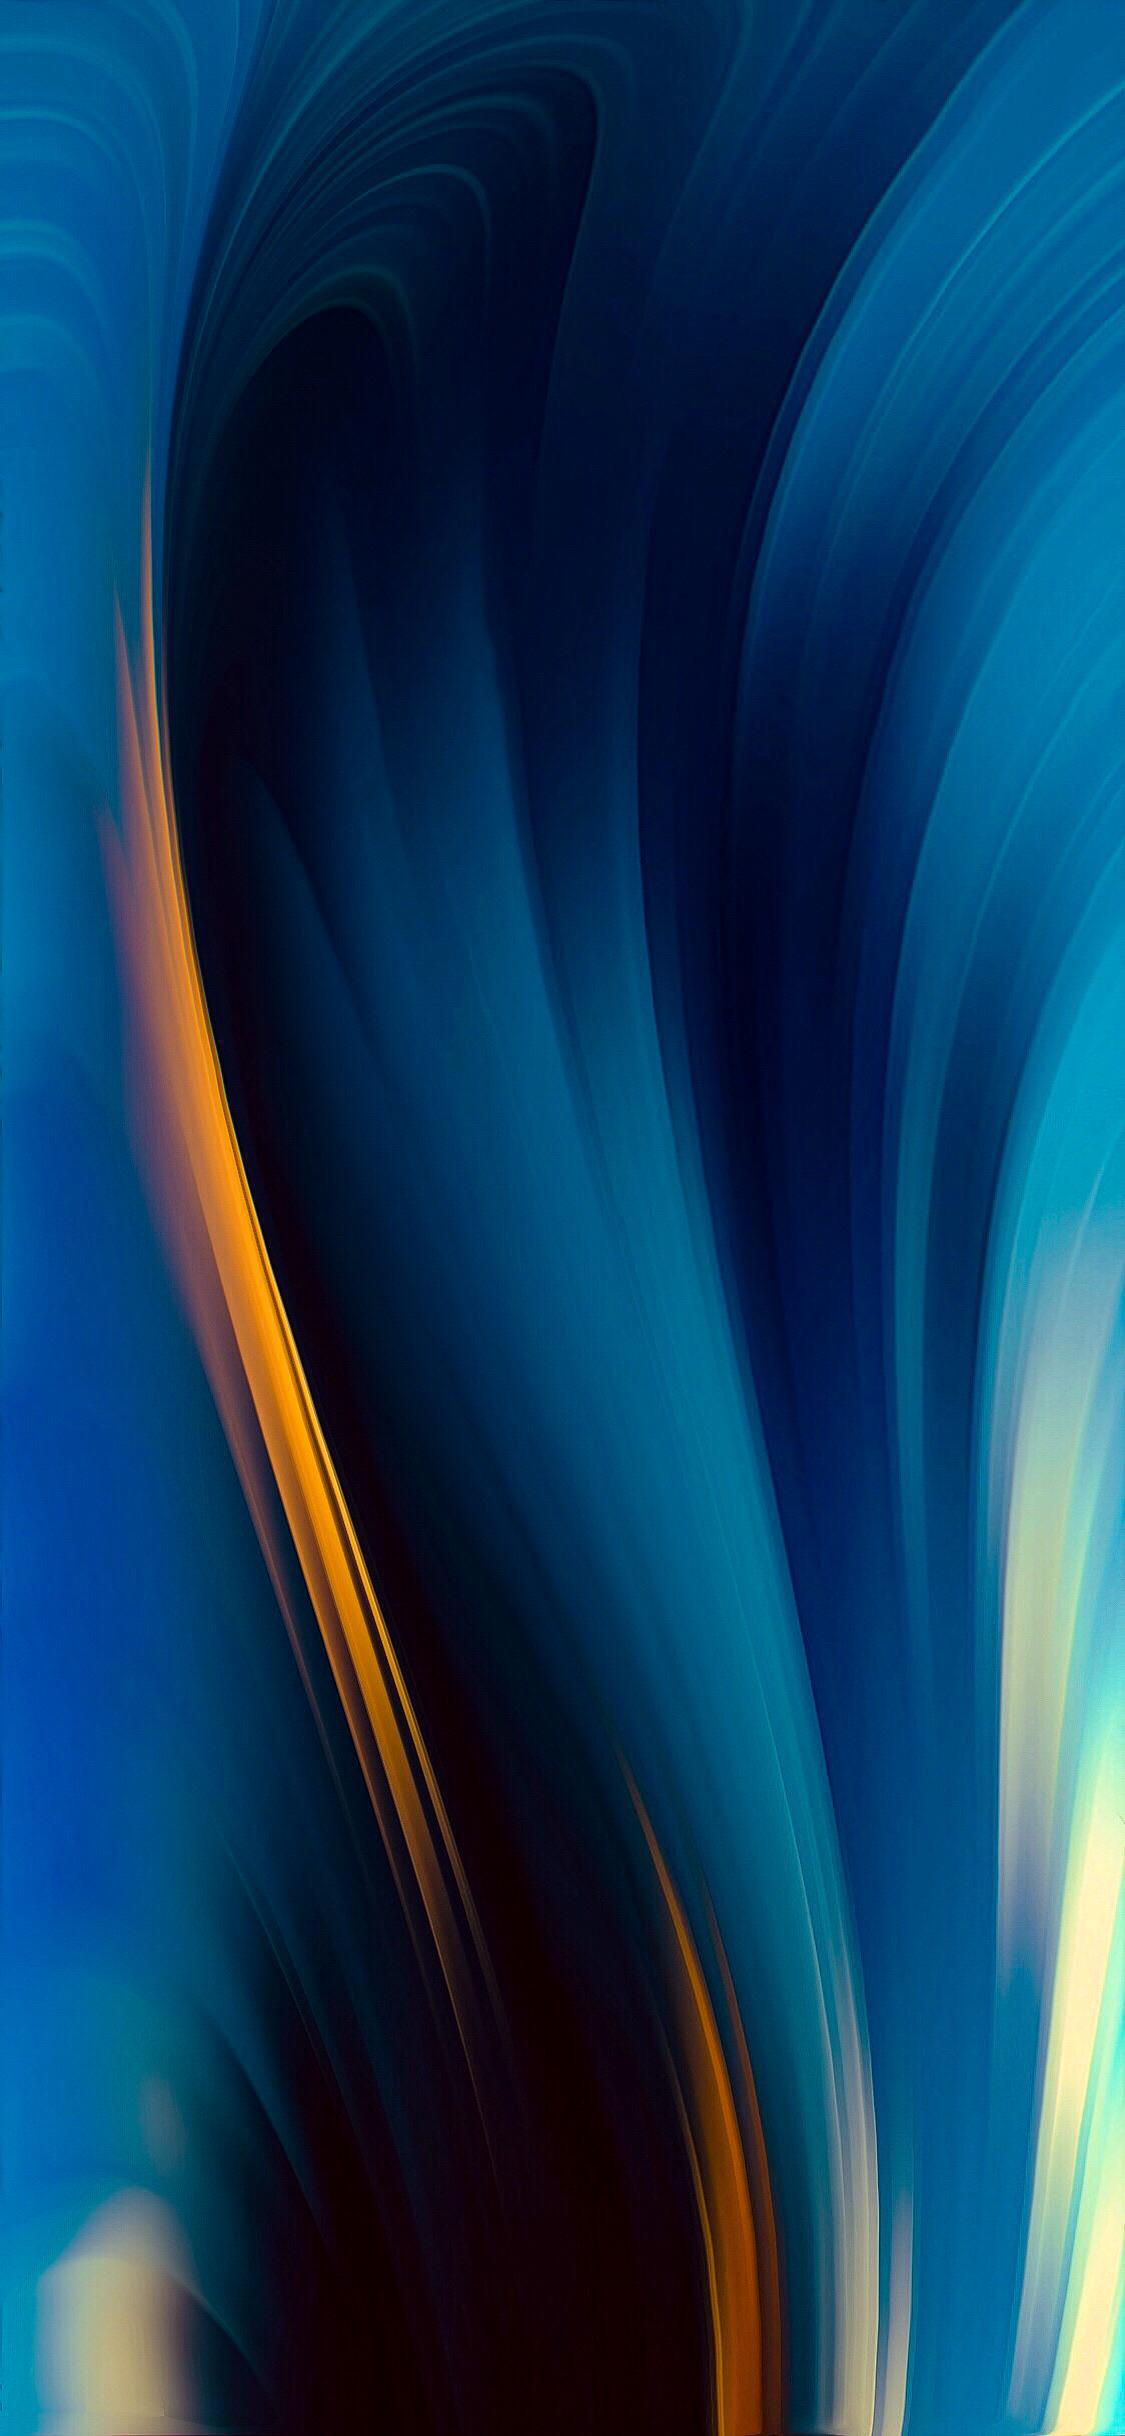 Iphone 11 Pro Wallpaper Colourful Wallpaper Iphone Abstract Wallpaper Iphone Wallpaper